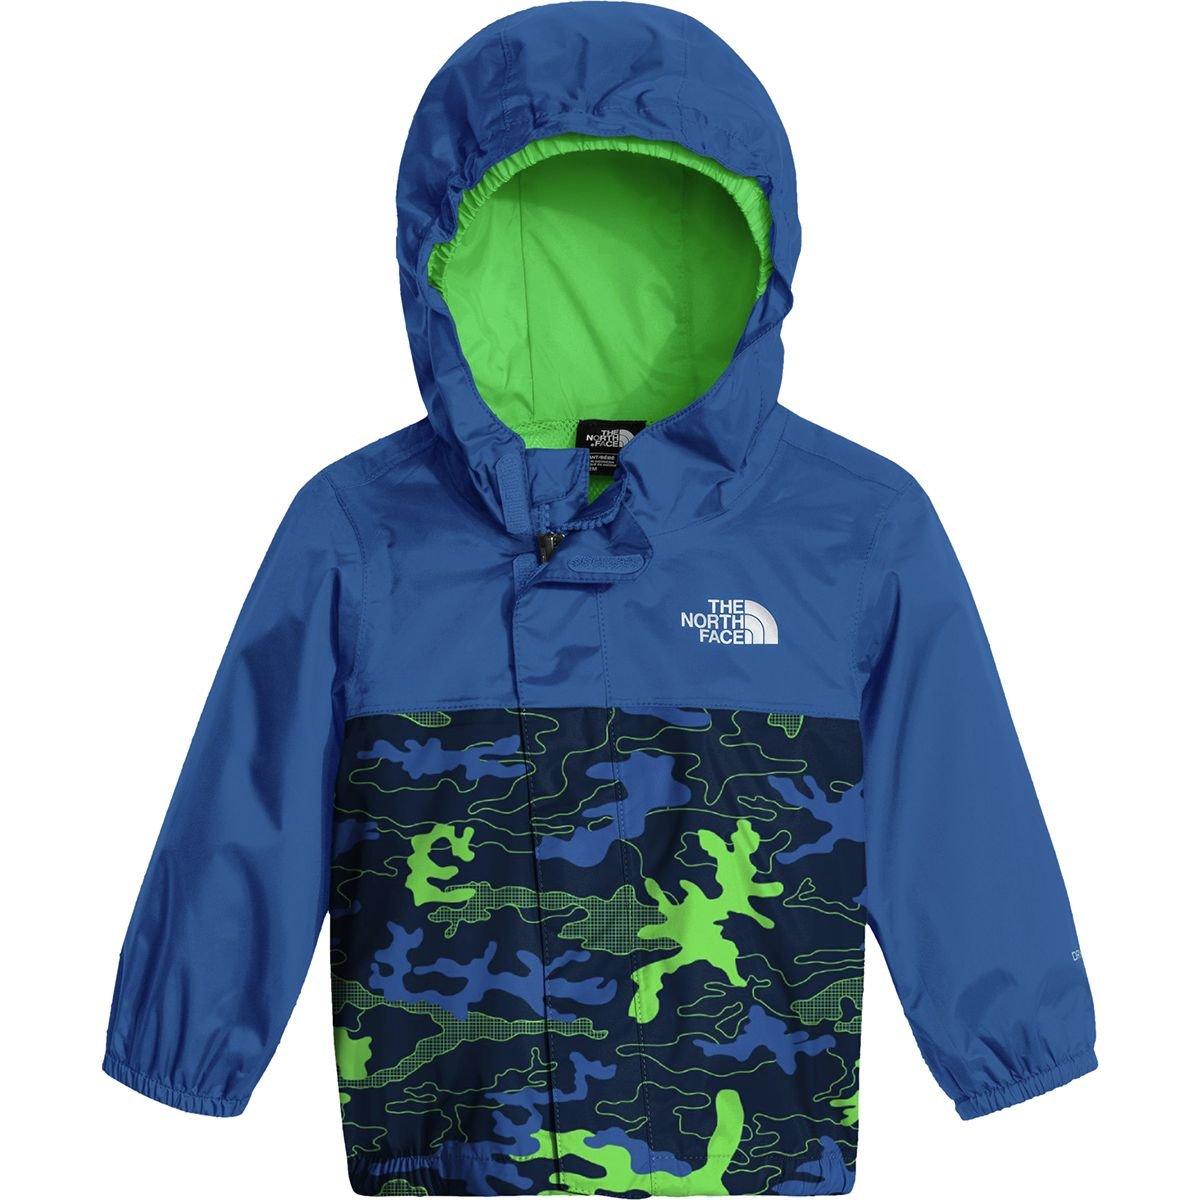 The North Face Infant Tailout Rain Jacket 2U3L